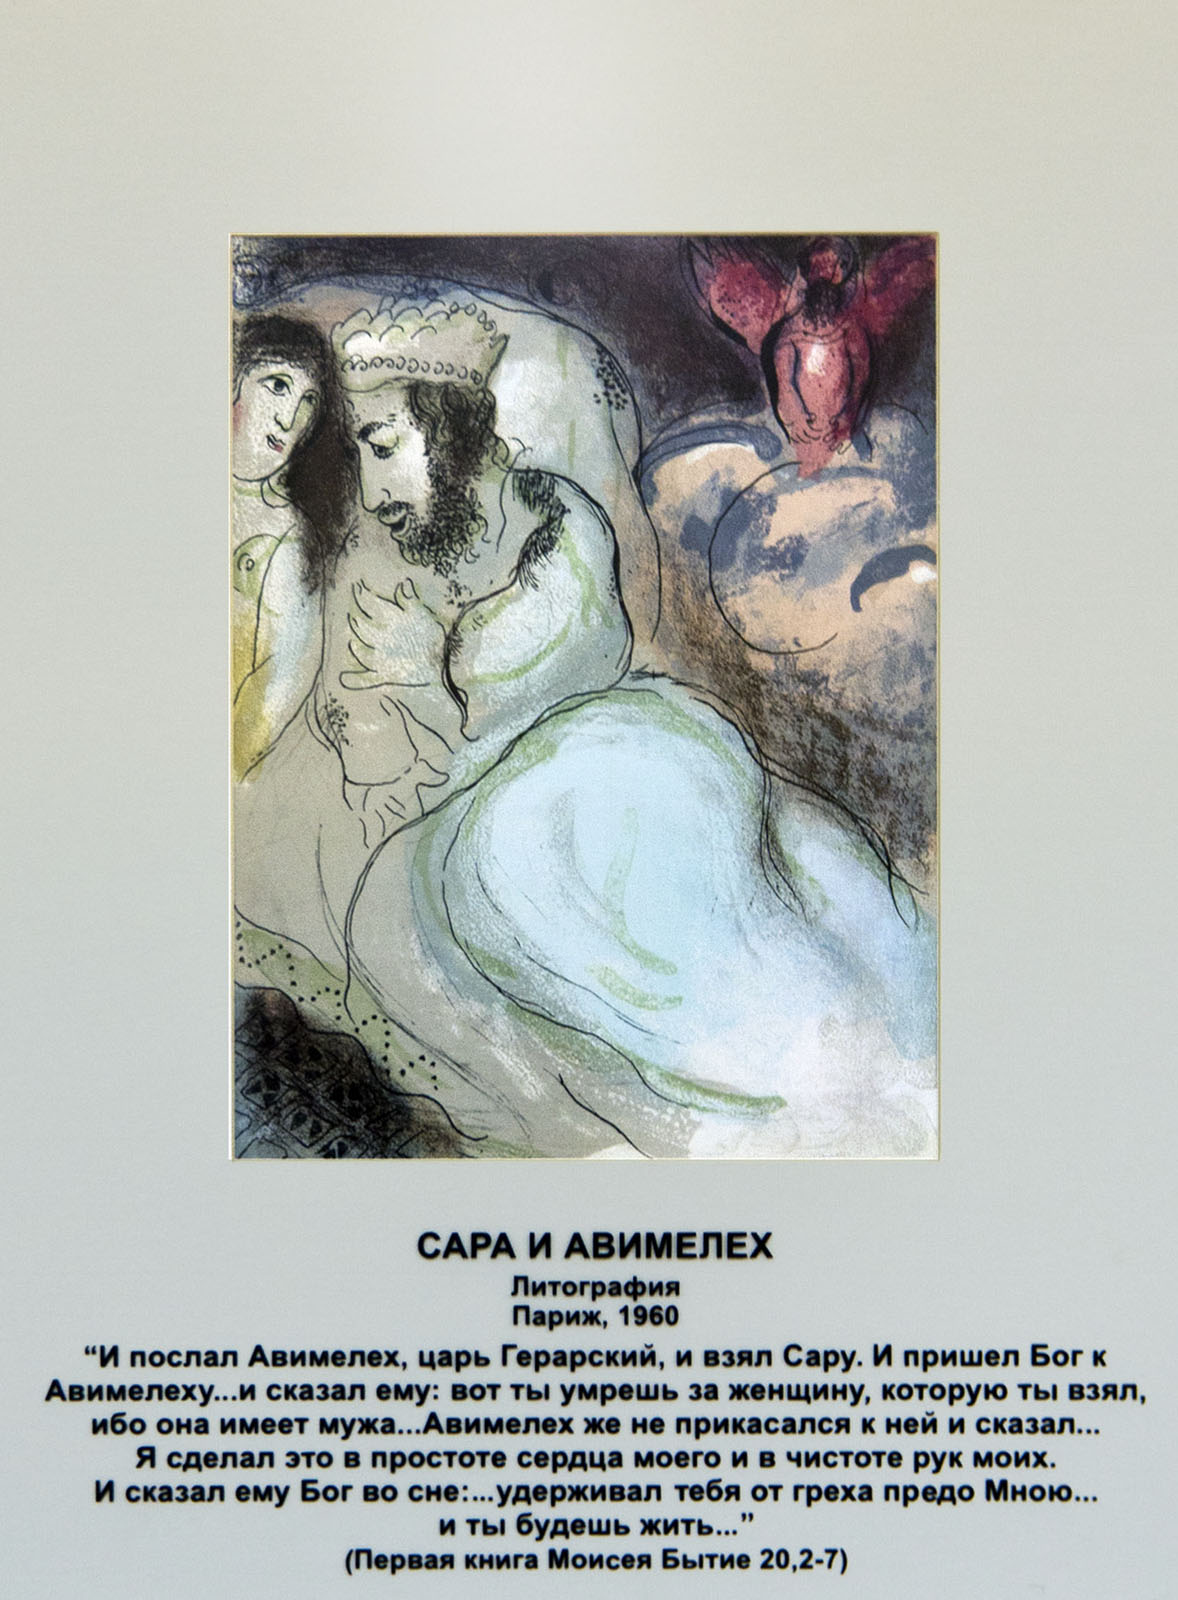 Фото №74381. «Сара и Авимелех», Марк Шагал, литография, Париж, 1960